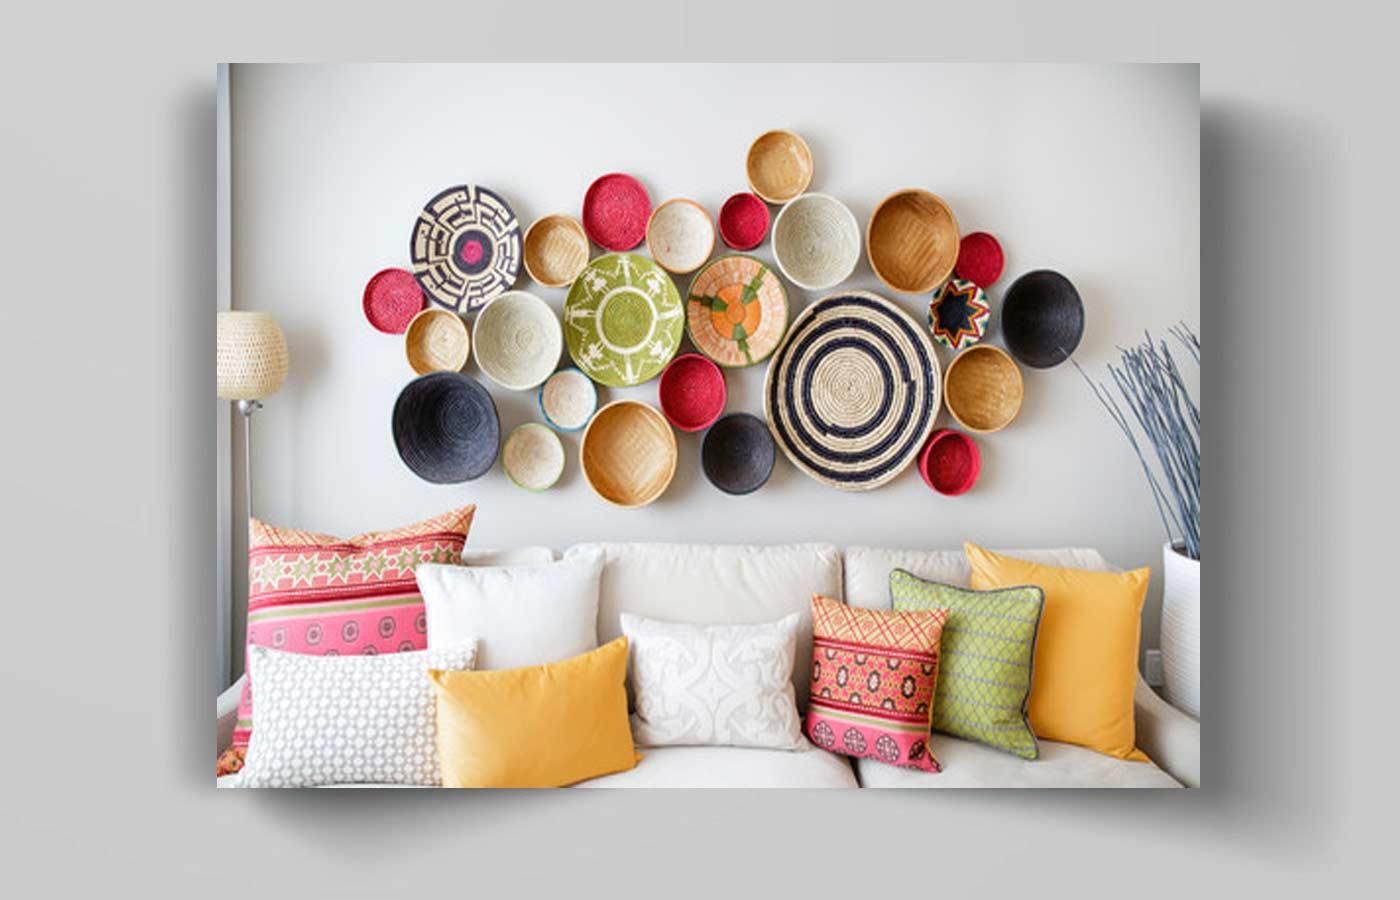 23rt - انواع آویز دیواری در دکوراسیون منزل